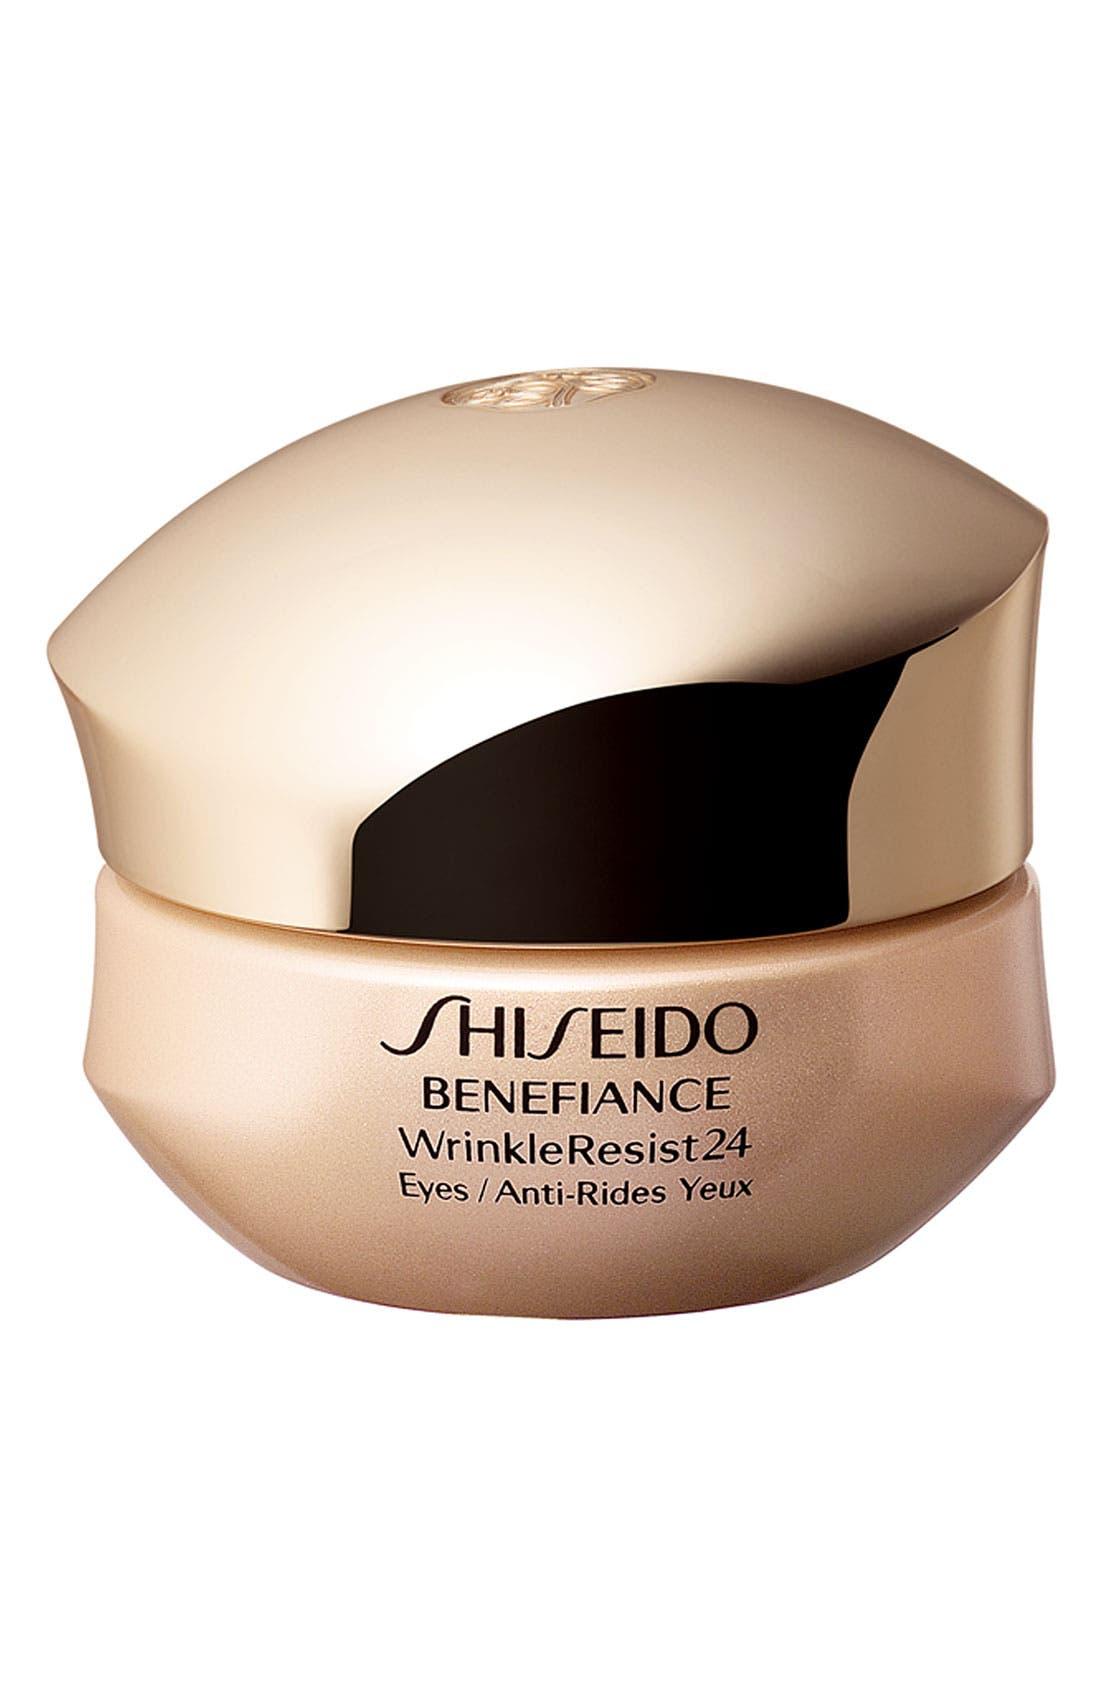 SHISEIDO Benefiance WrinkleResist24 Intensive Eye Contour Cream, Main, color, NO COLOR